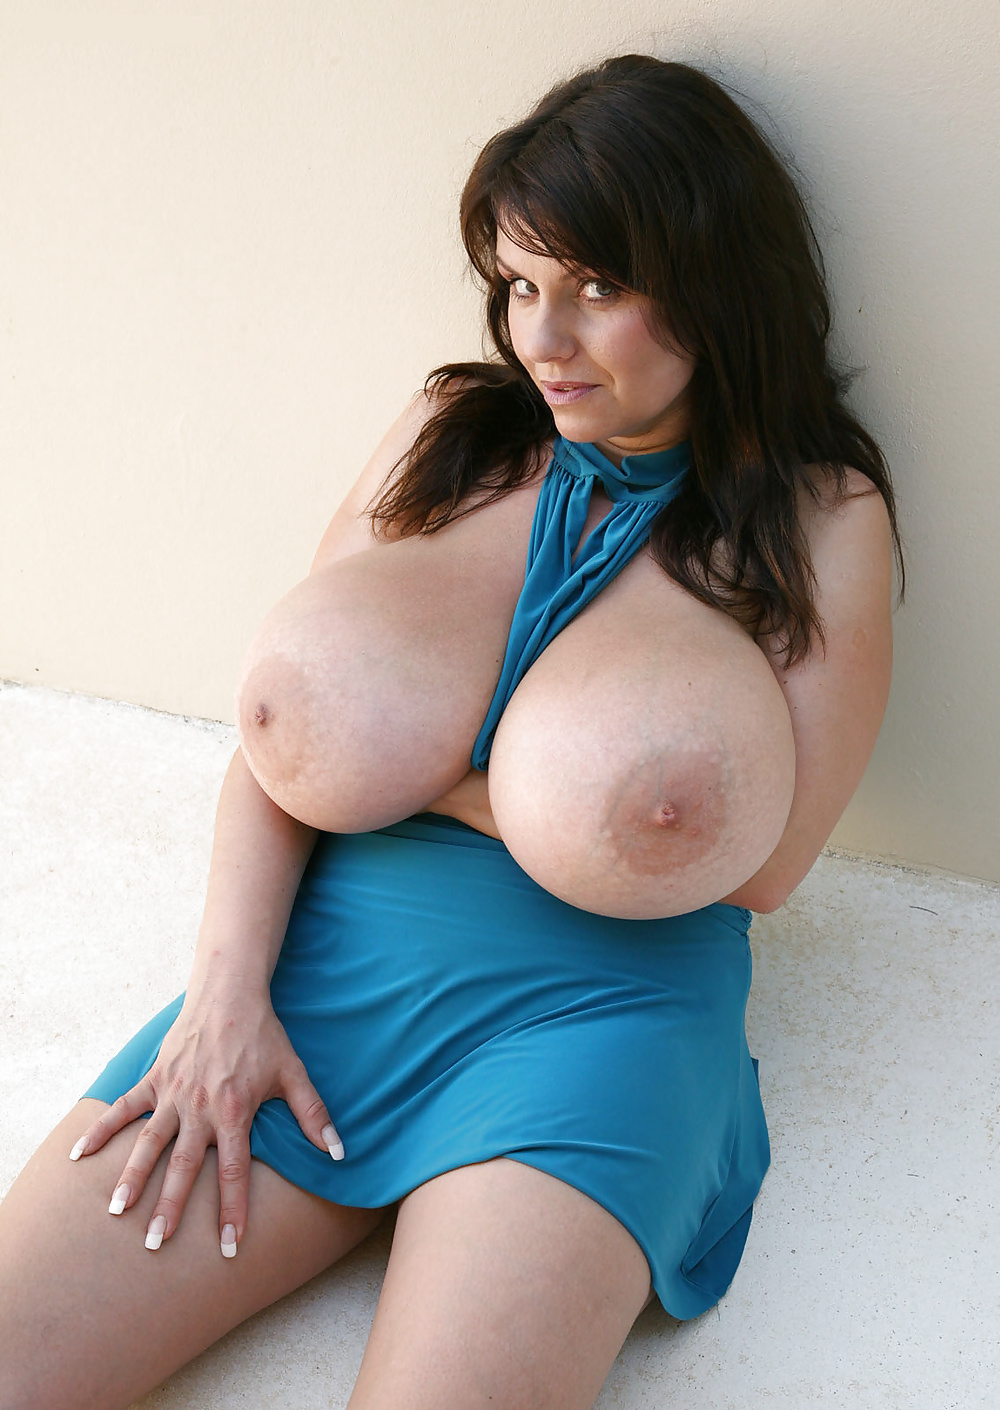 Penis porn chunky girl pics anal compilation